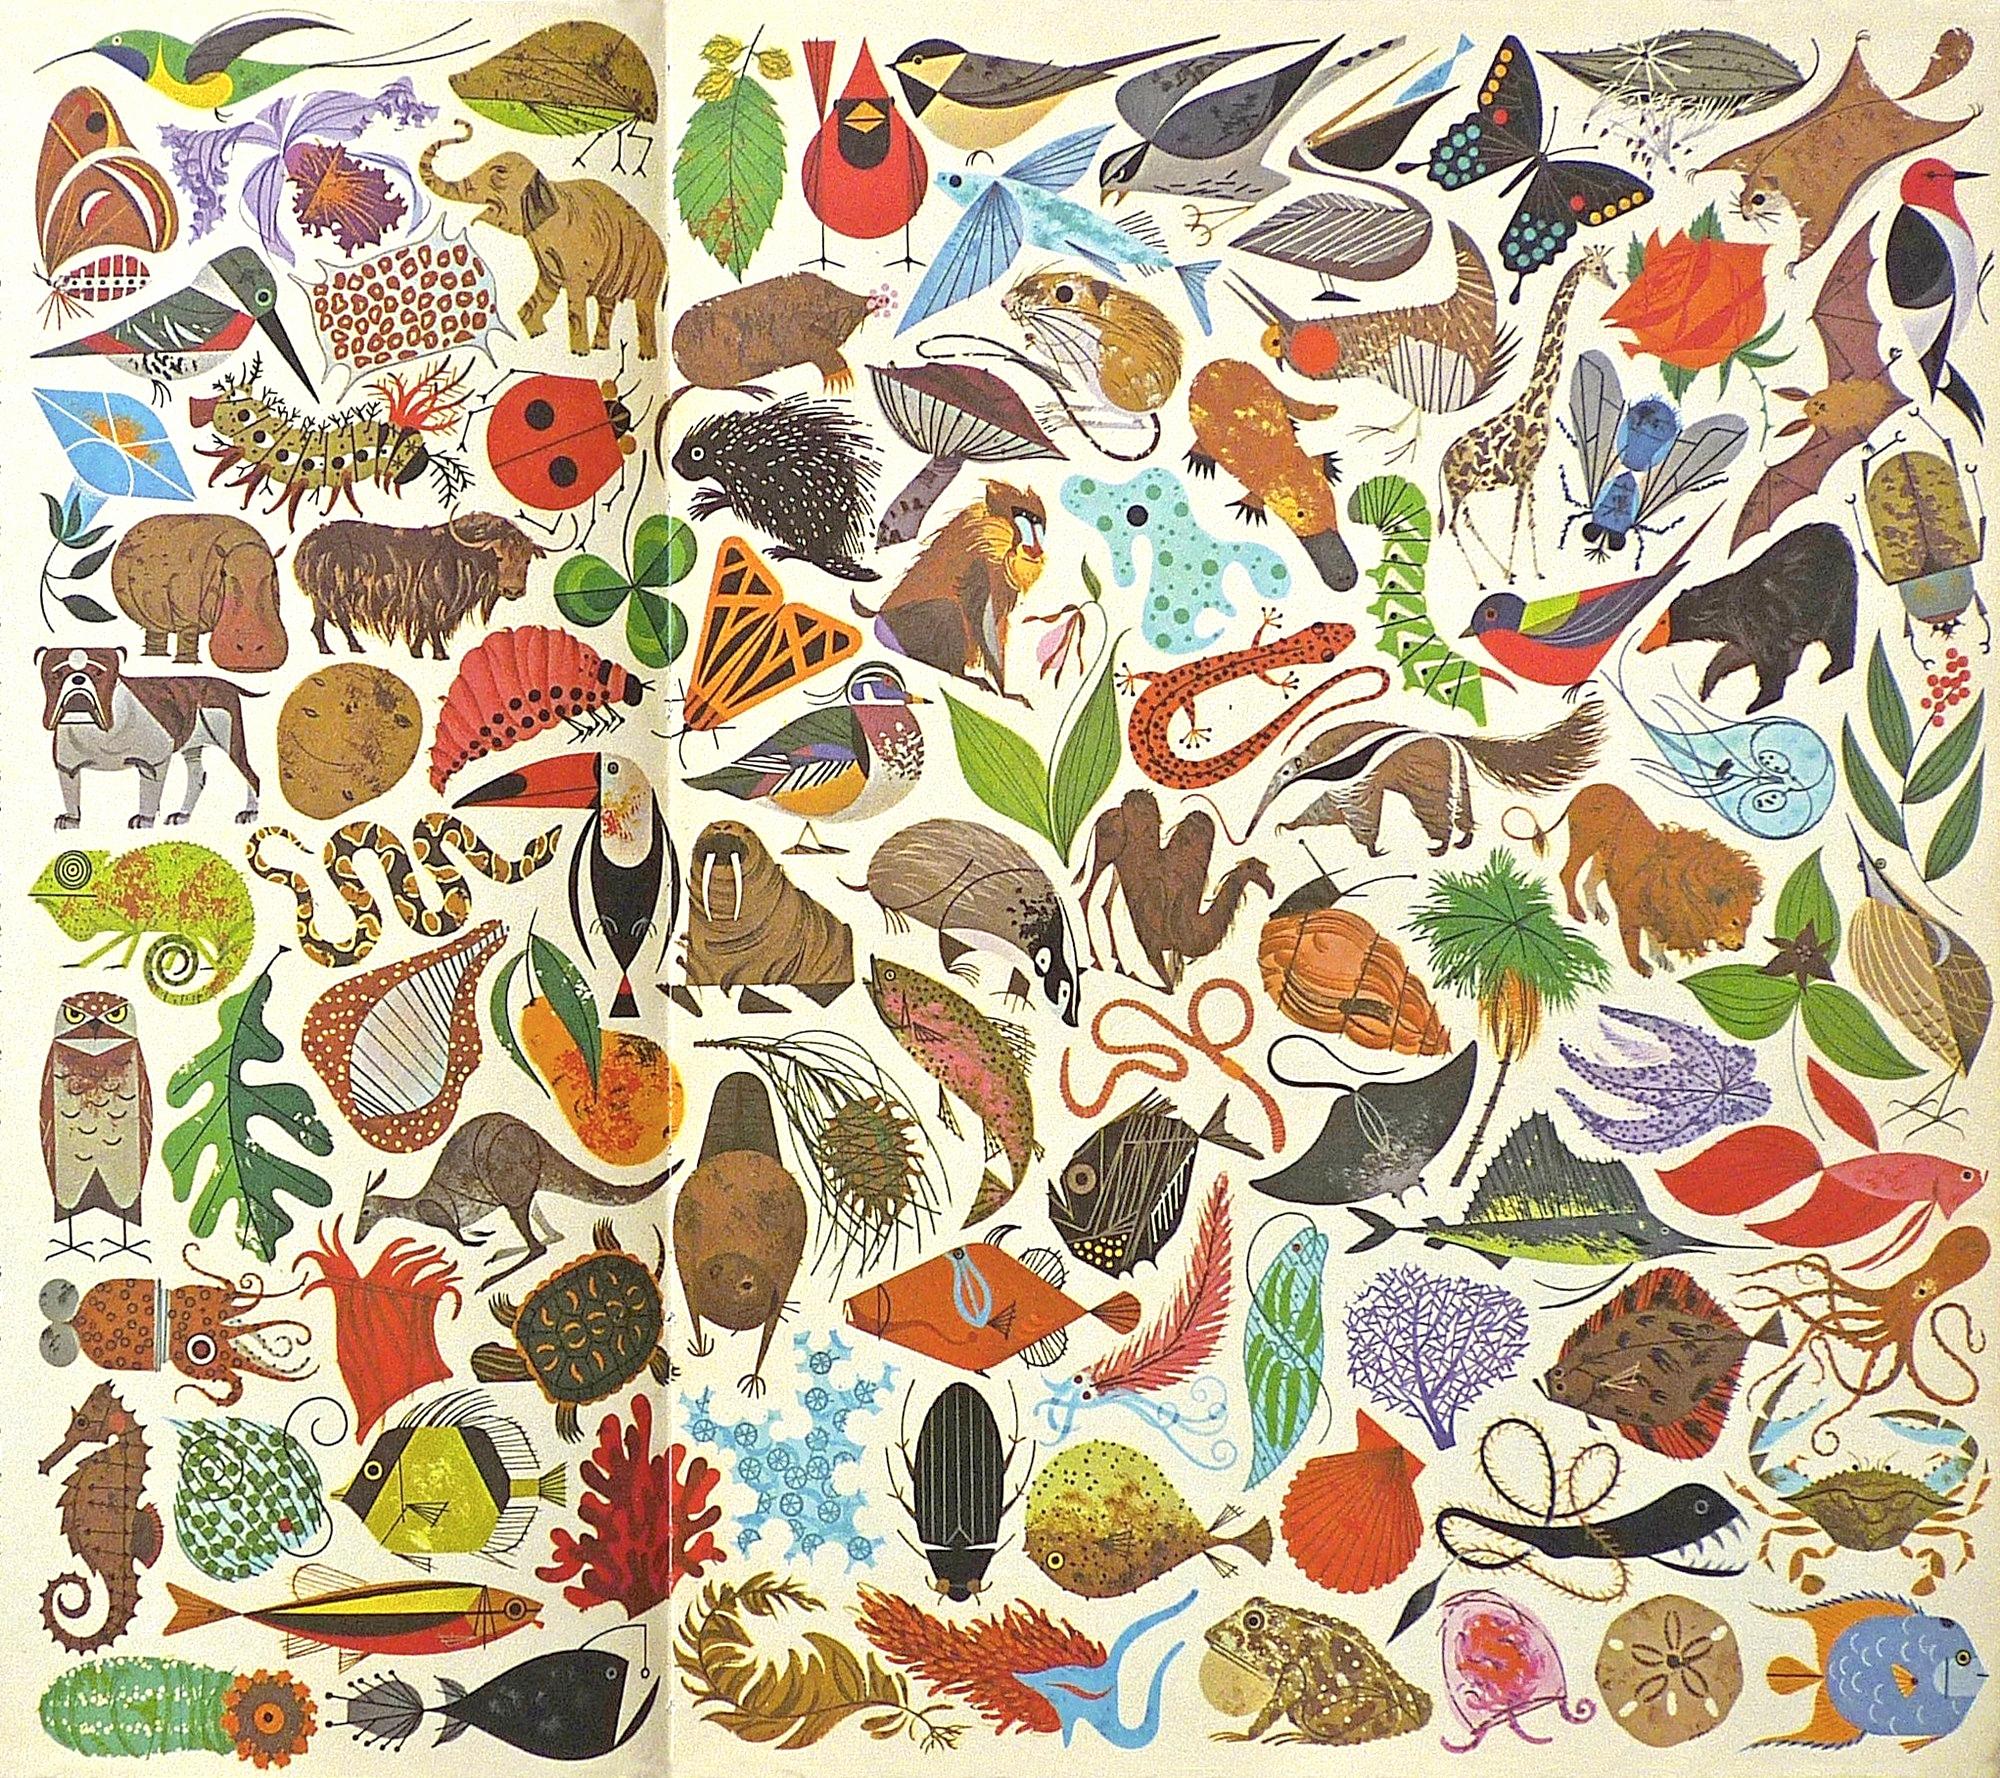 animal-illustrations-casey-cripe.jpg